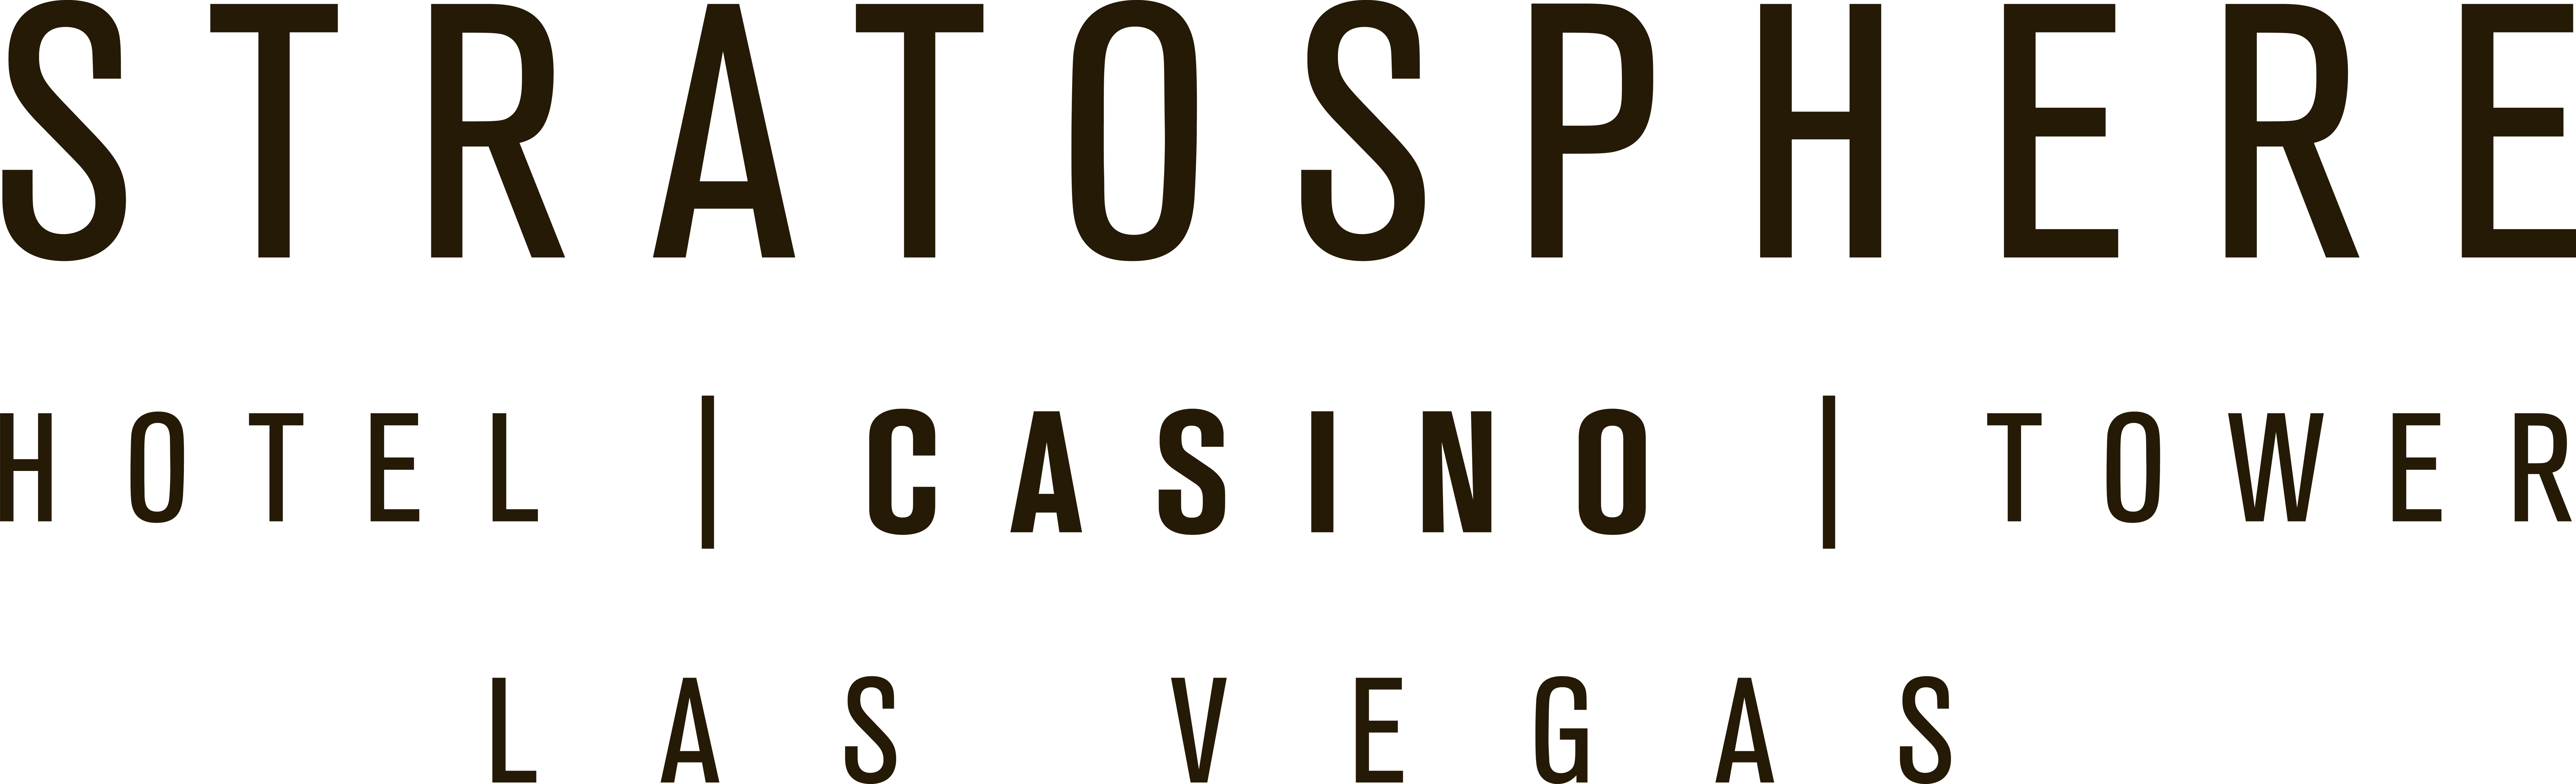 Stratosphere Casino, Hotel & Tower logo